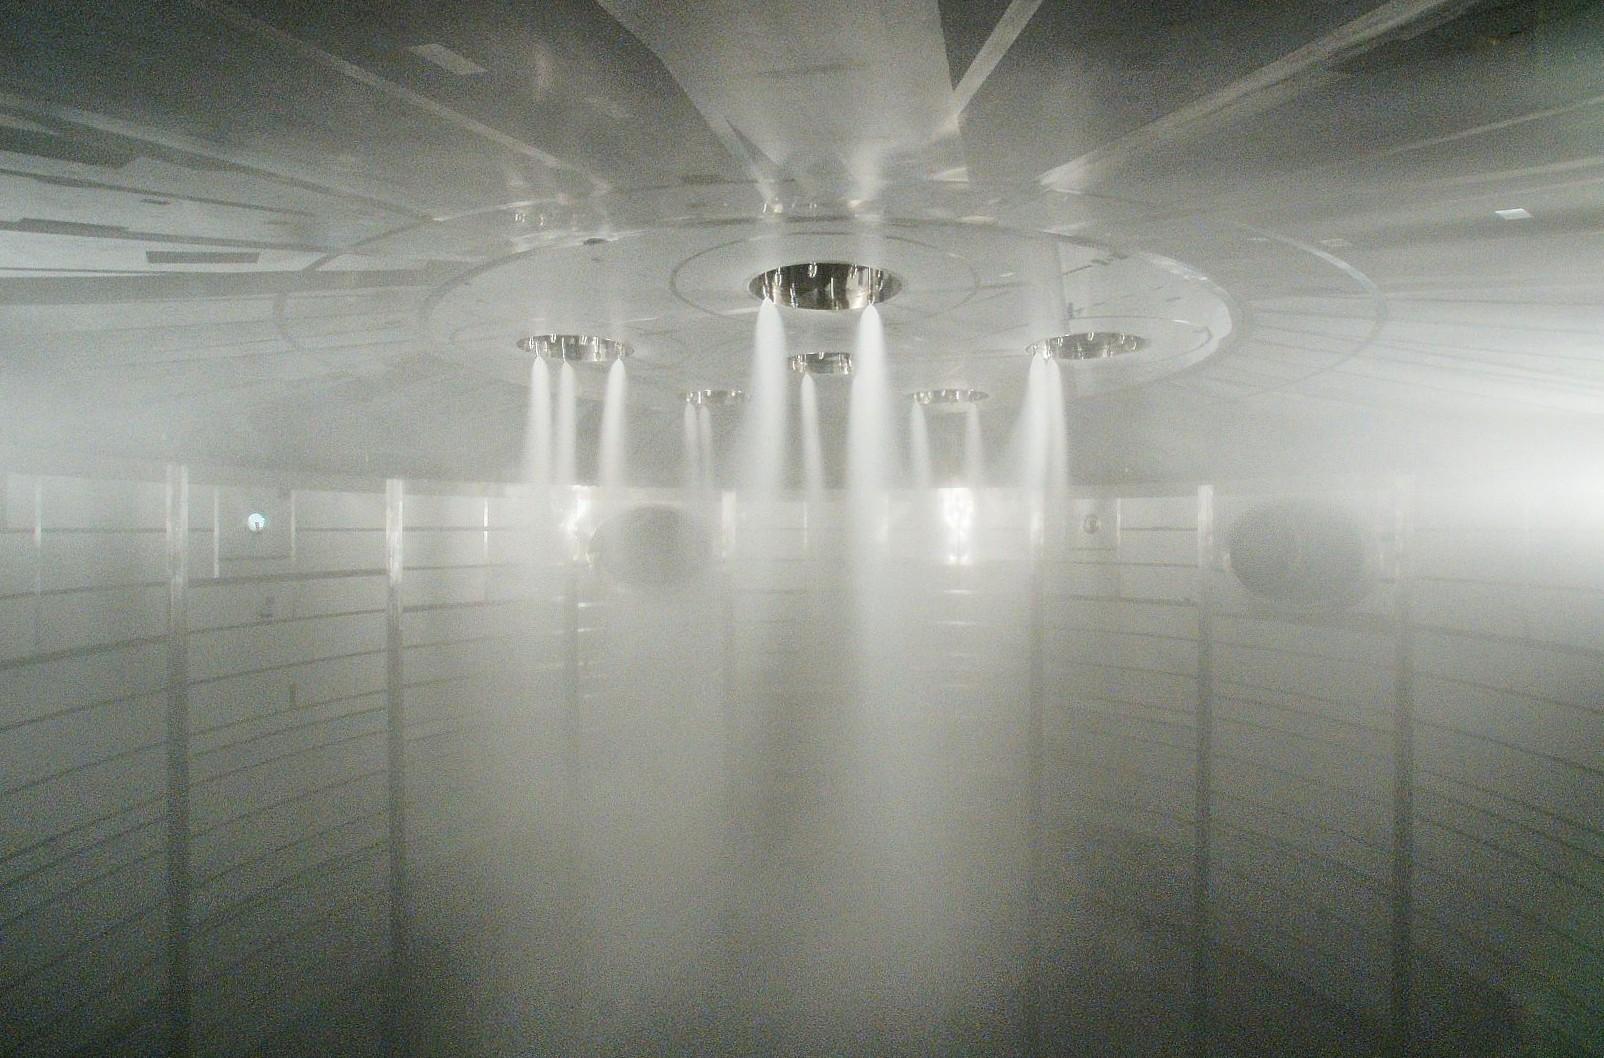 Spray drying in brief